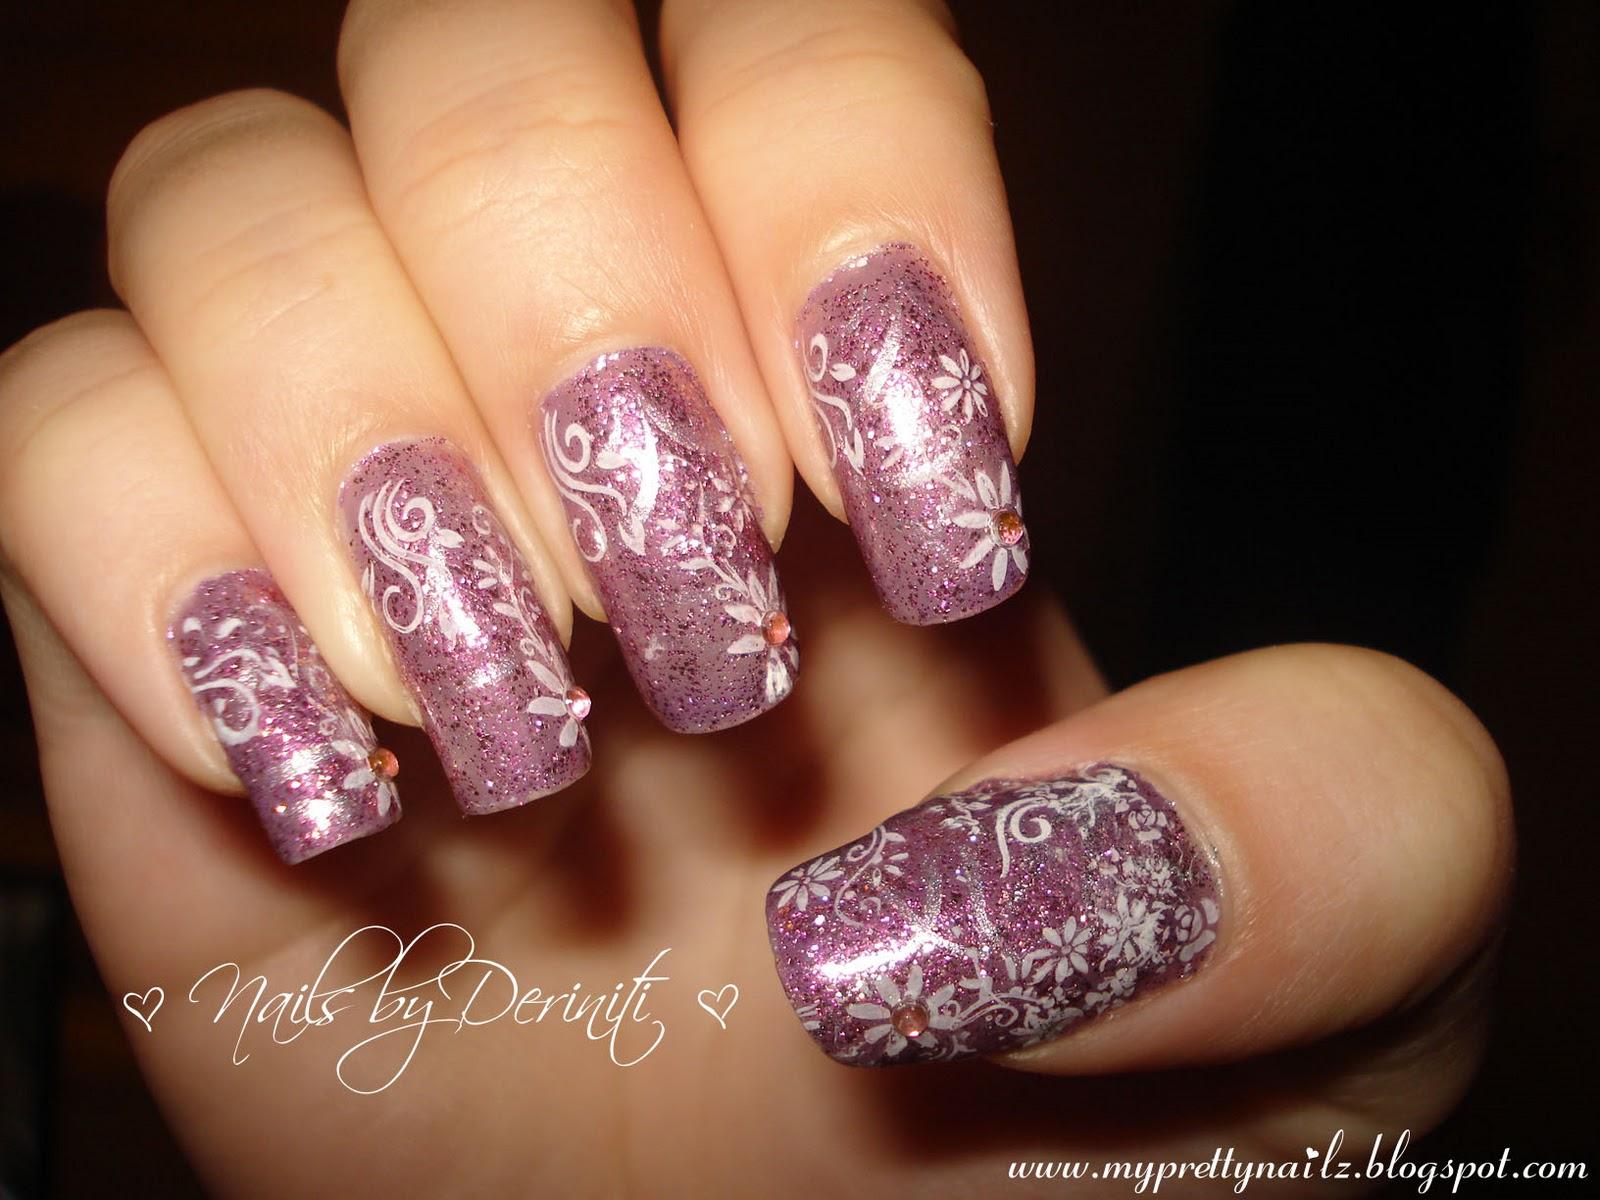 My Pretty Nailz: Glittery Purple Nails with Flowers Nail ...